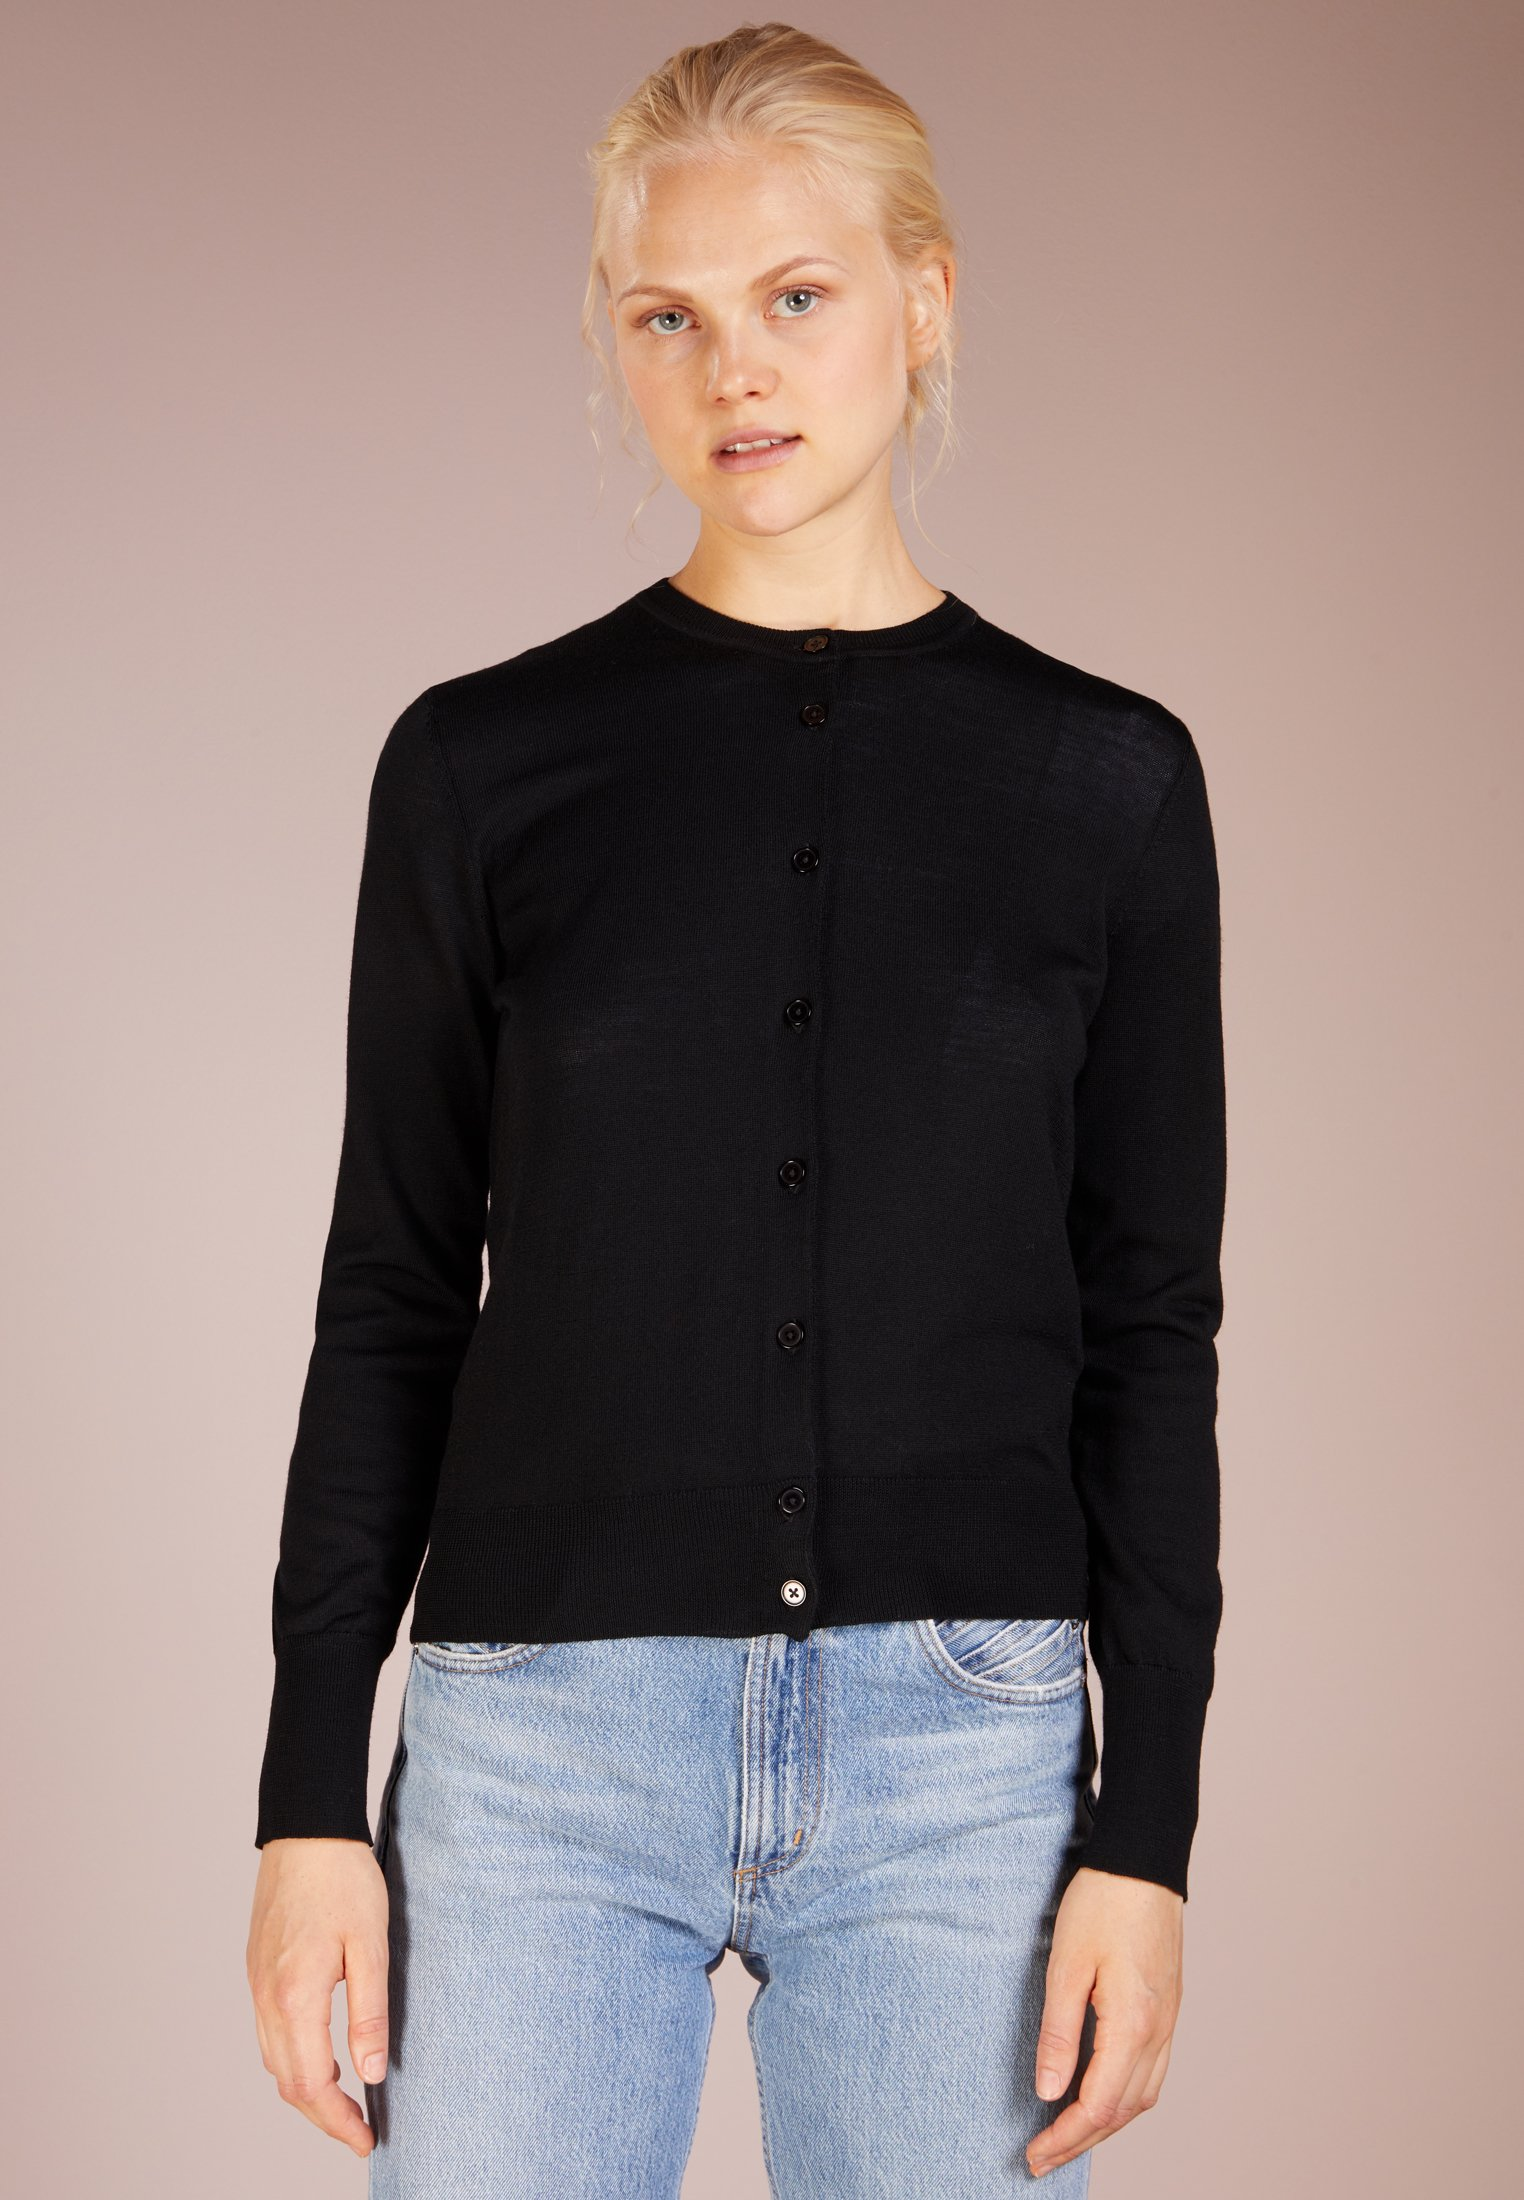 Filippa K Gilet - black - Pulls & Gilets Femme L68cM